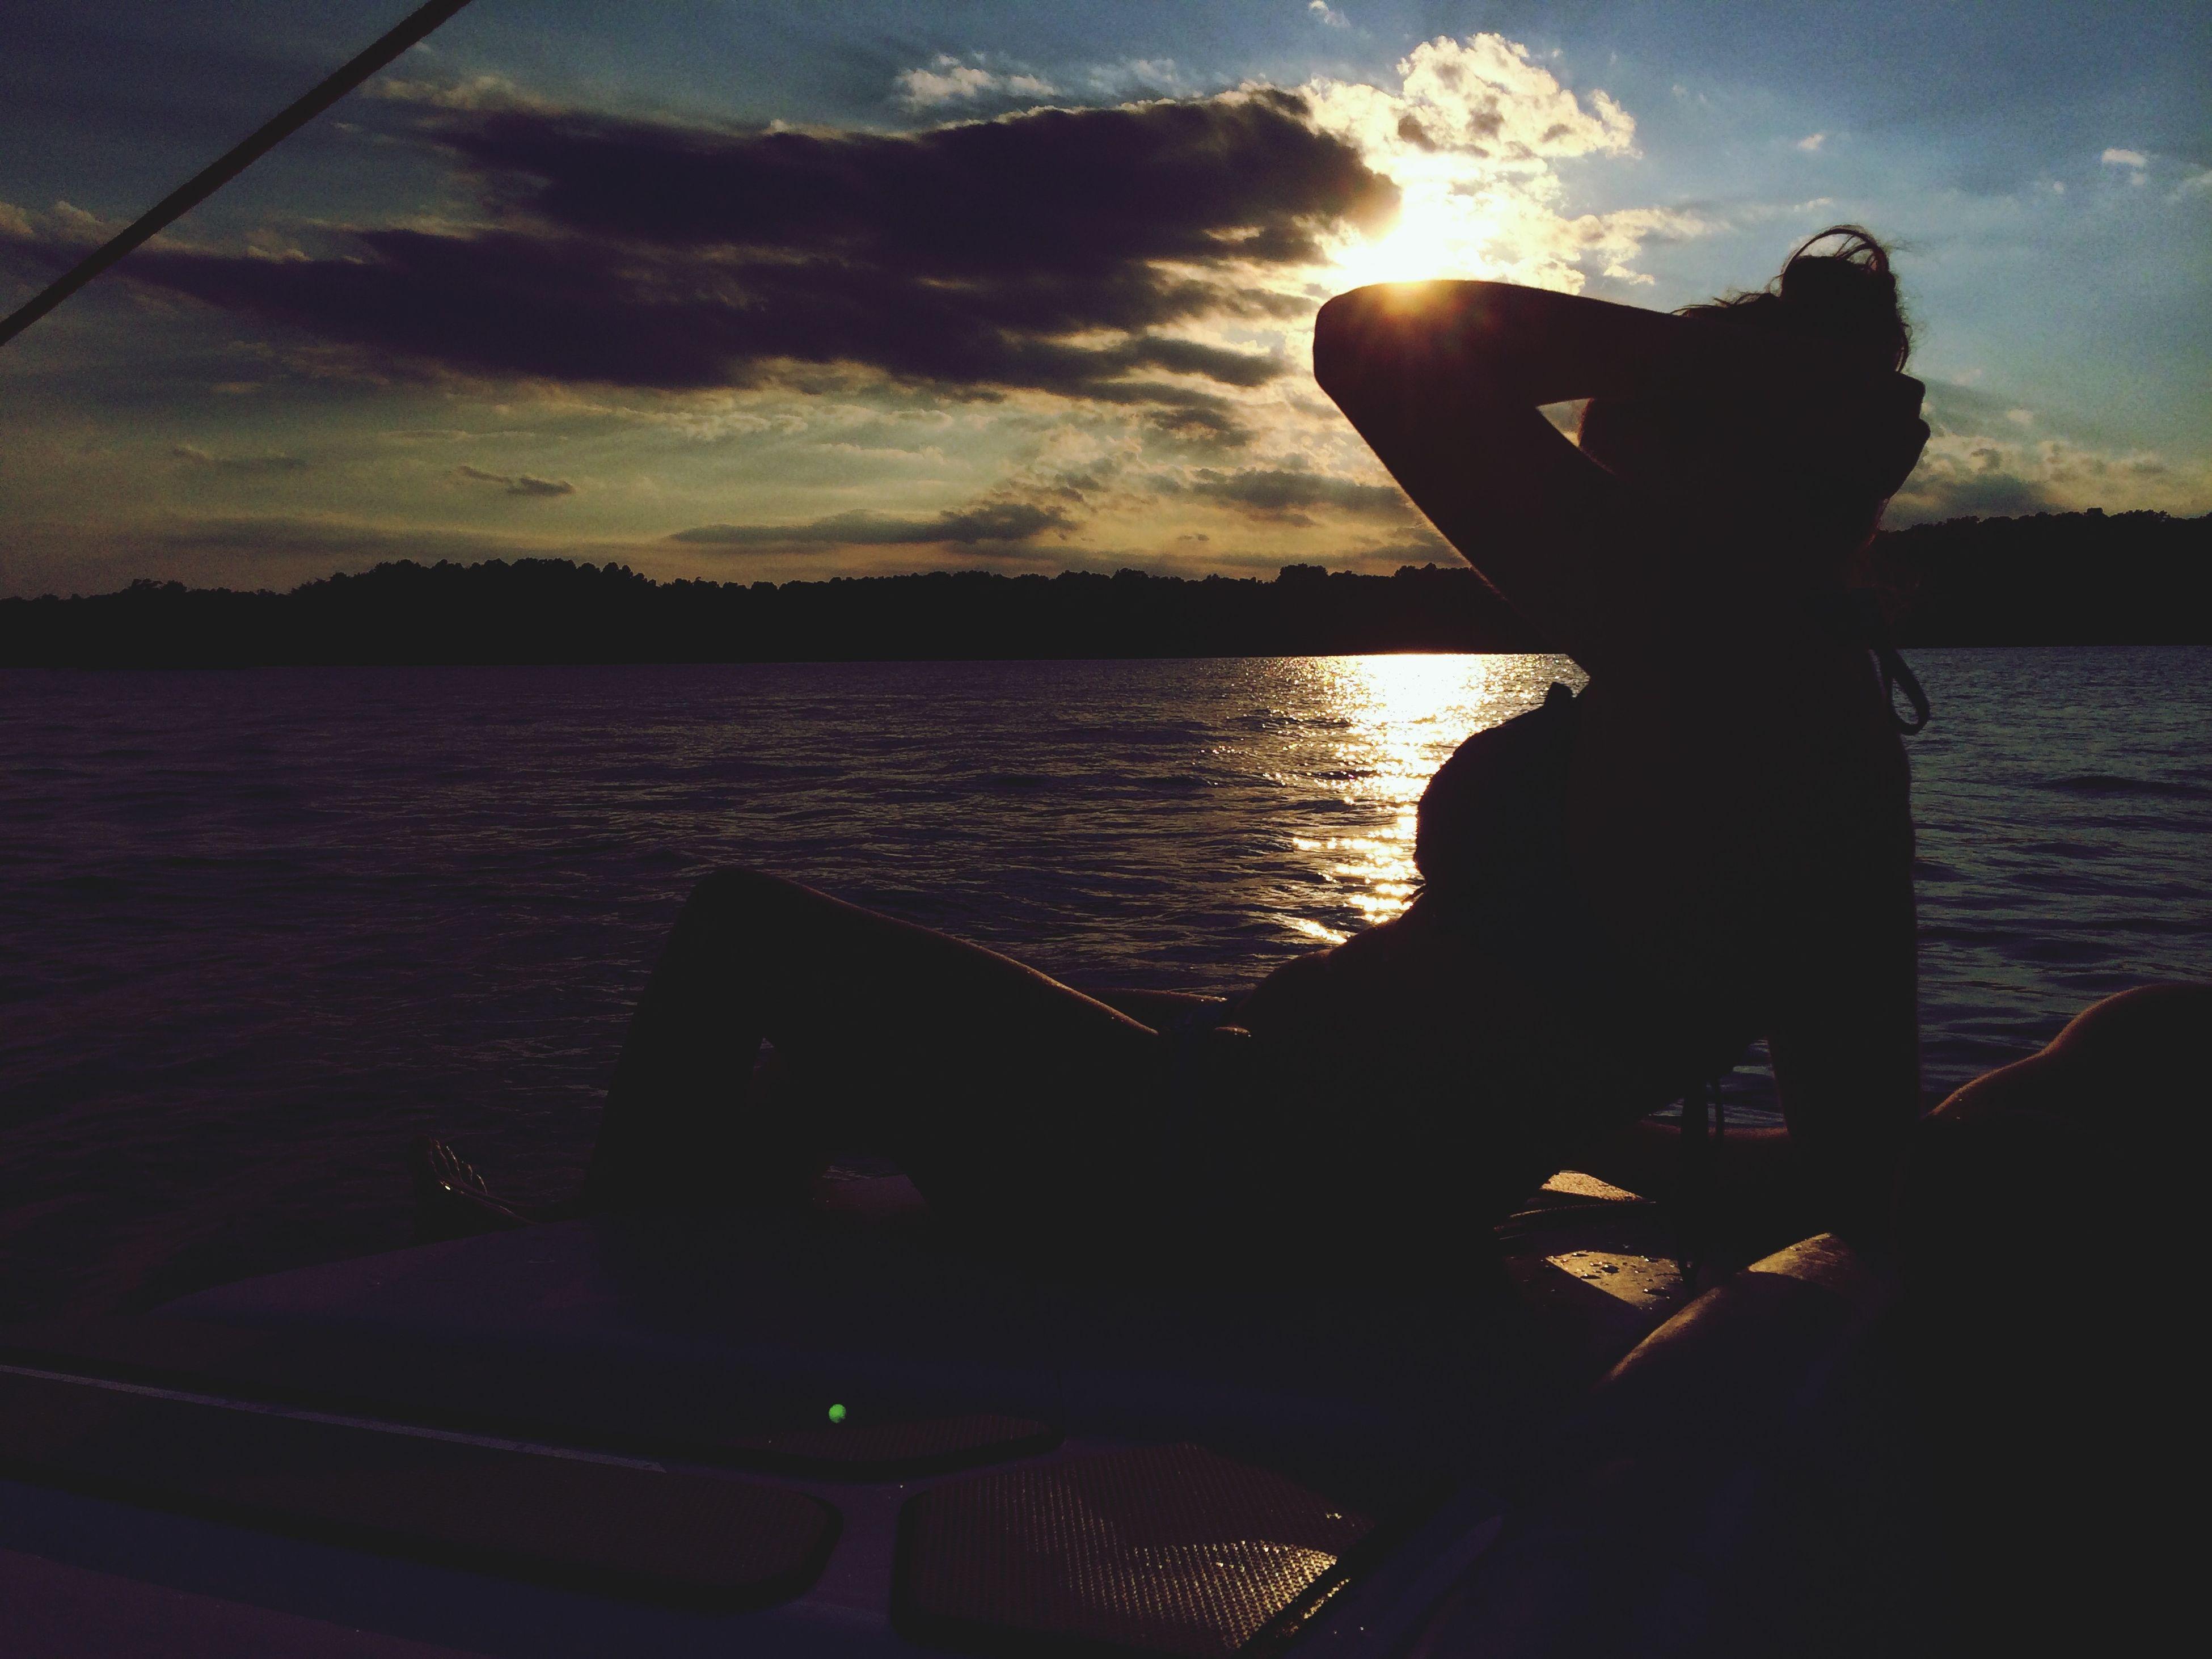 silhouette, water, sky, sunset, cloud - sky, sea, reflection, cloud, sunlight, sun, nature, dusk, standing, men, leisure activity, outdoors, beauty in nature, lifestyles